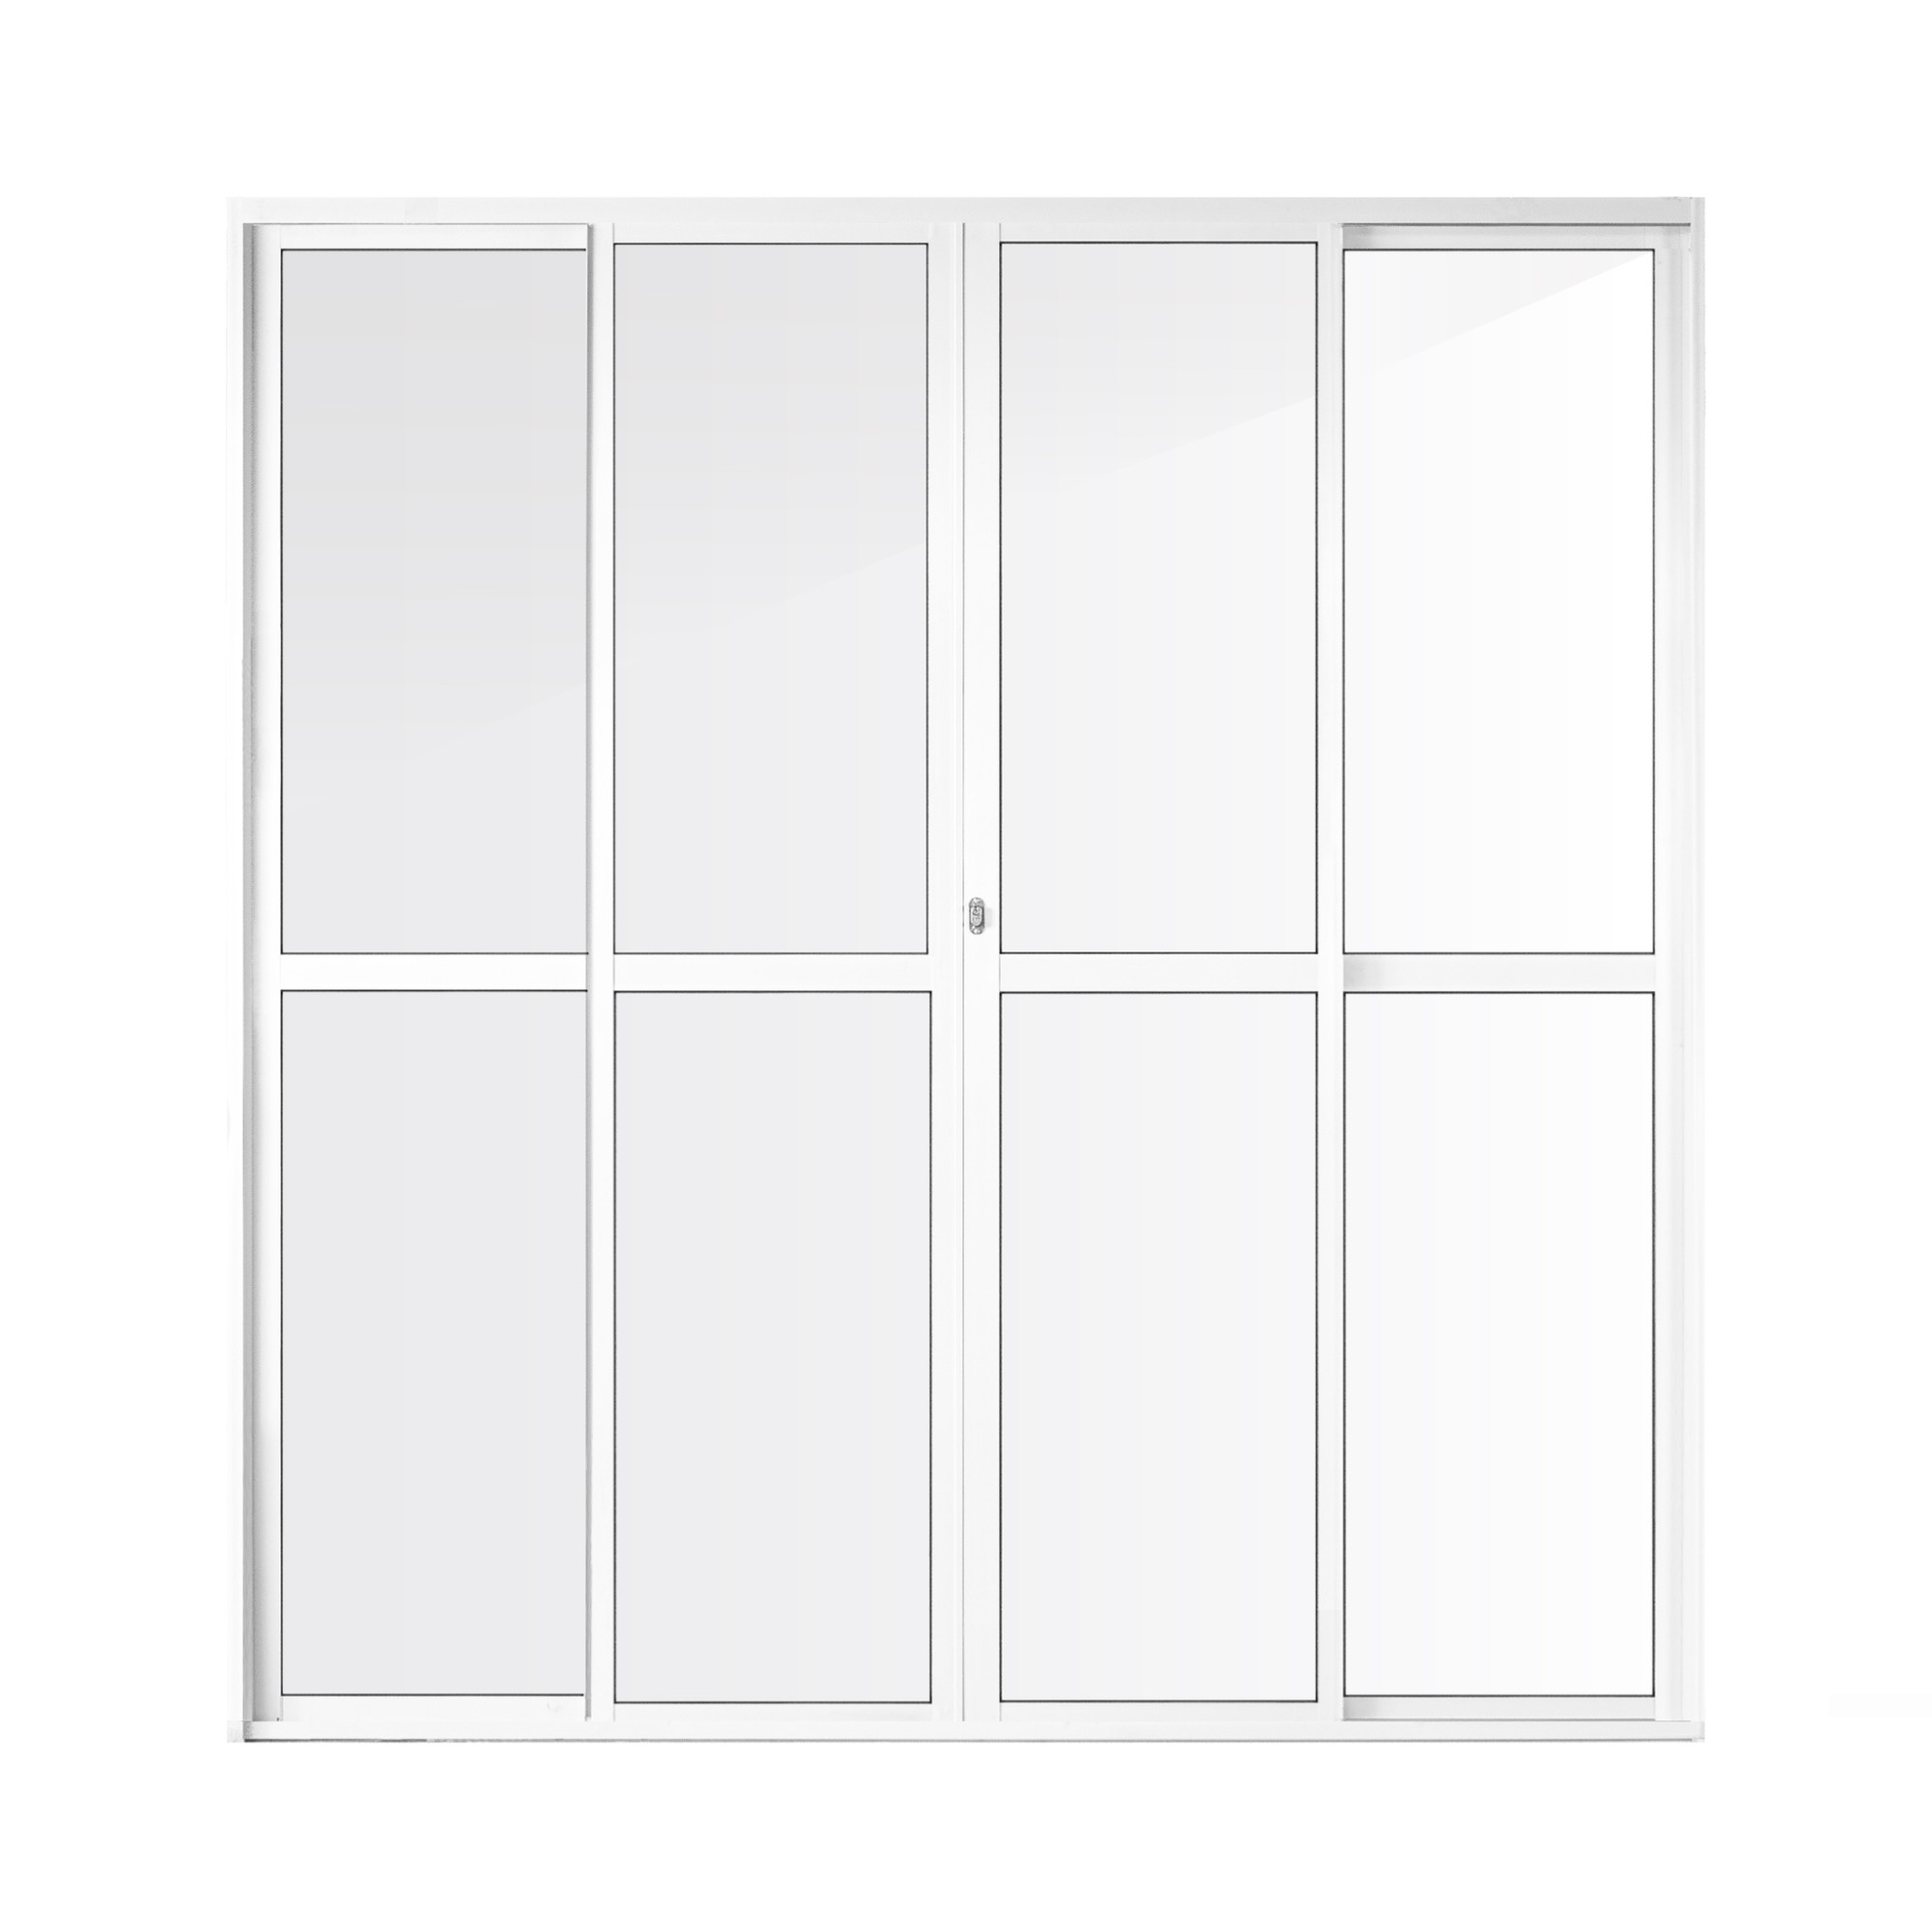 Porta Balcao de Aluminio 4 Folhas 210 x 200 cm Branca Metalflex - Aluvid